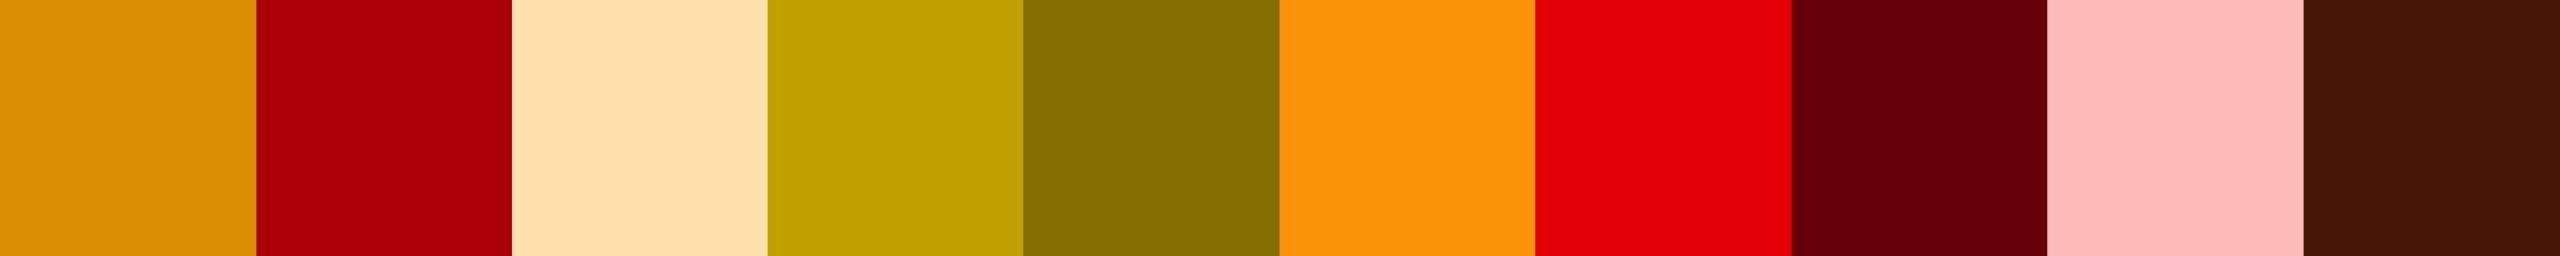 430 Risdena Color Palette